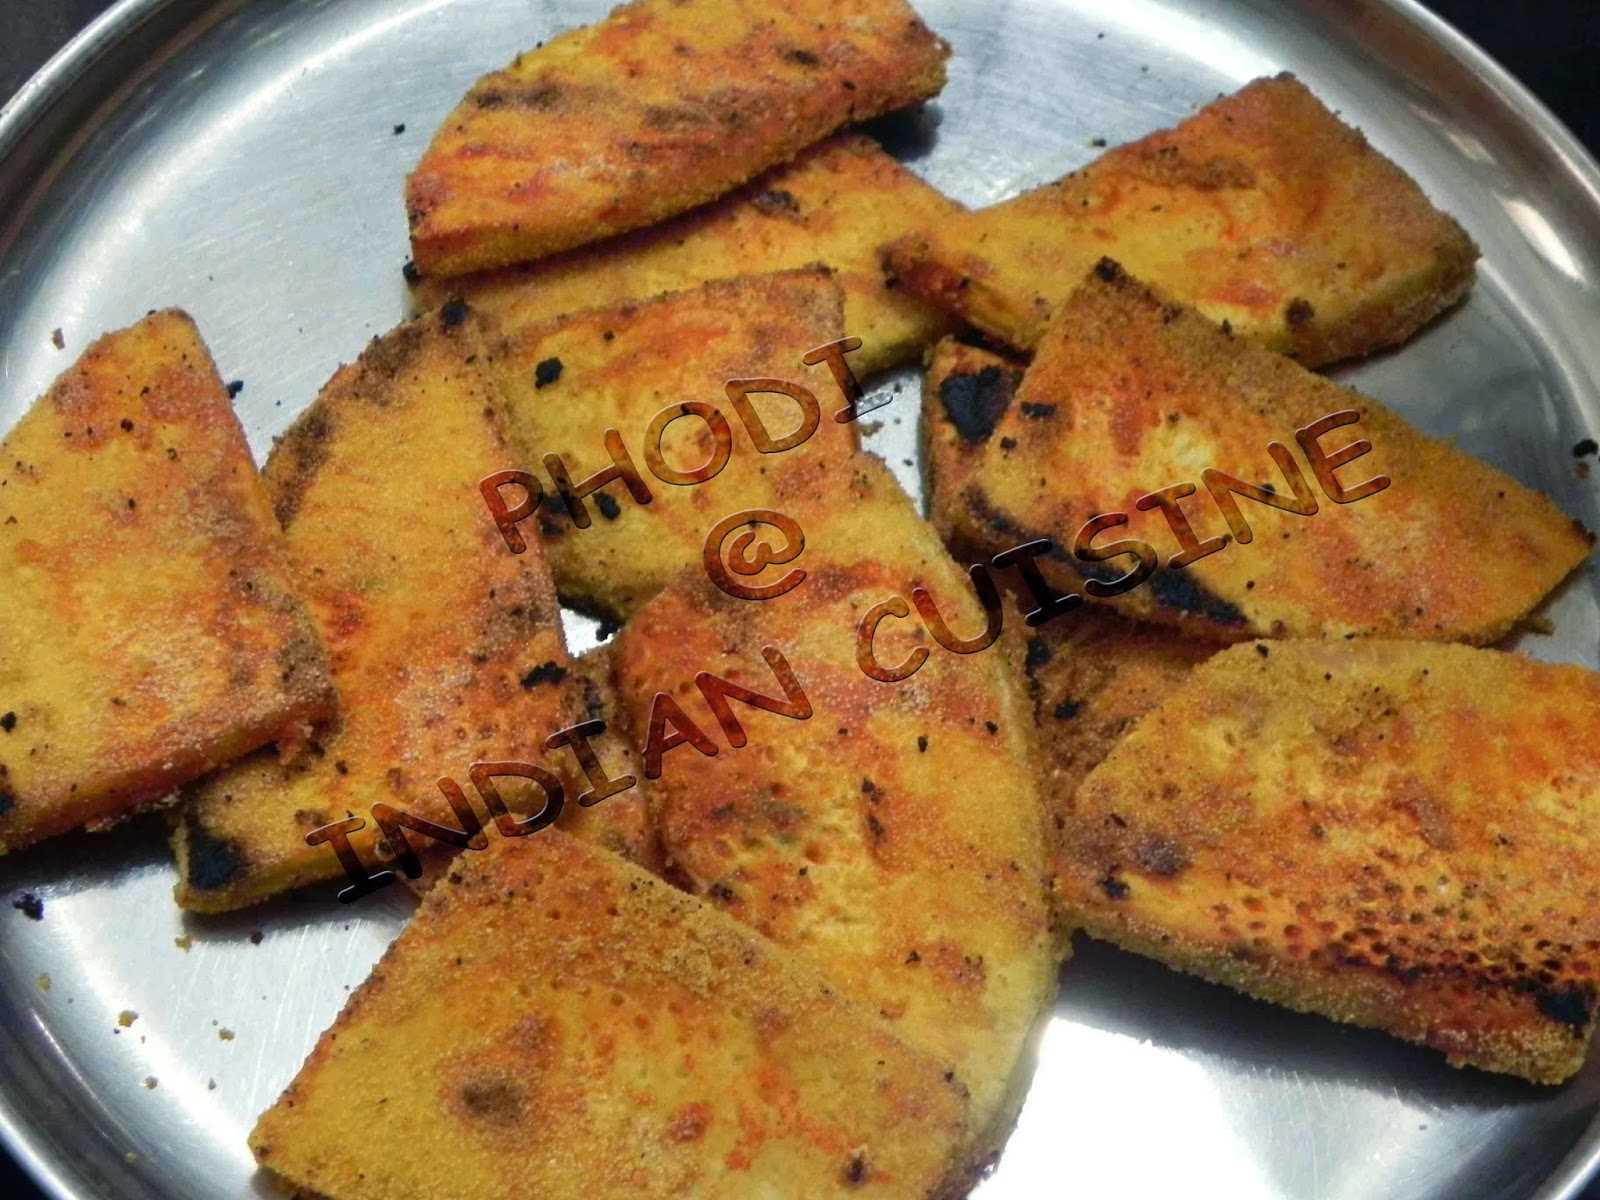 Konkani style vegetable fritters or phodi breadfruit or jeev konkani style vegetable fritters or phodi breadfruit or jeev kadgee phodi or palapanasa kadagi phodi mulangi or raddish phodi raw banana phodi forumfinder Gallery